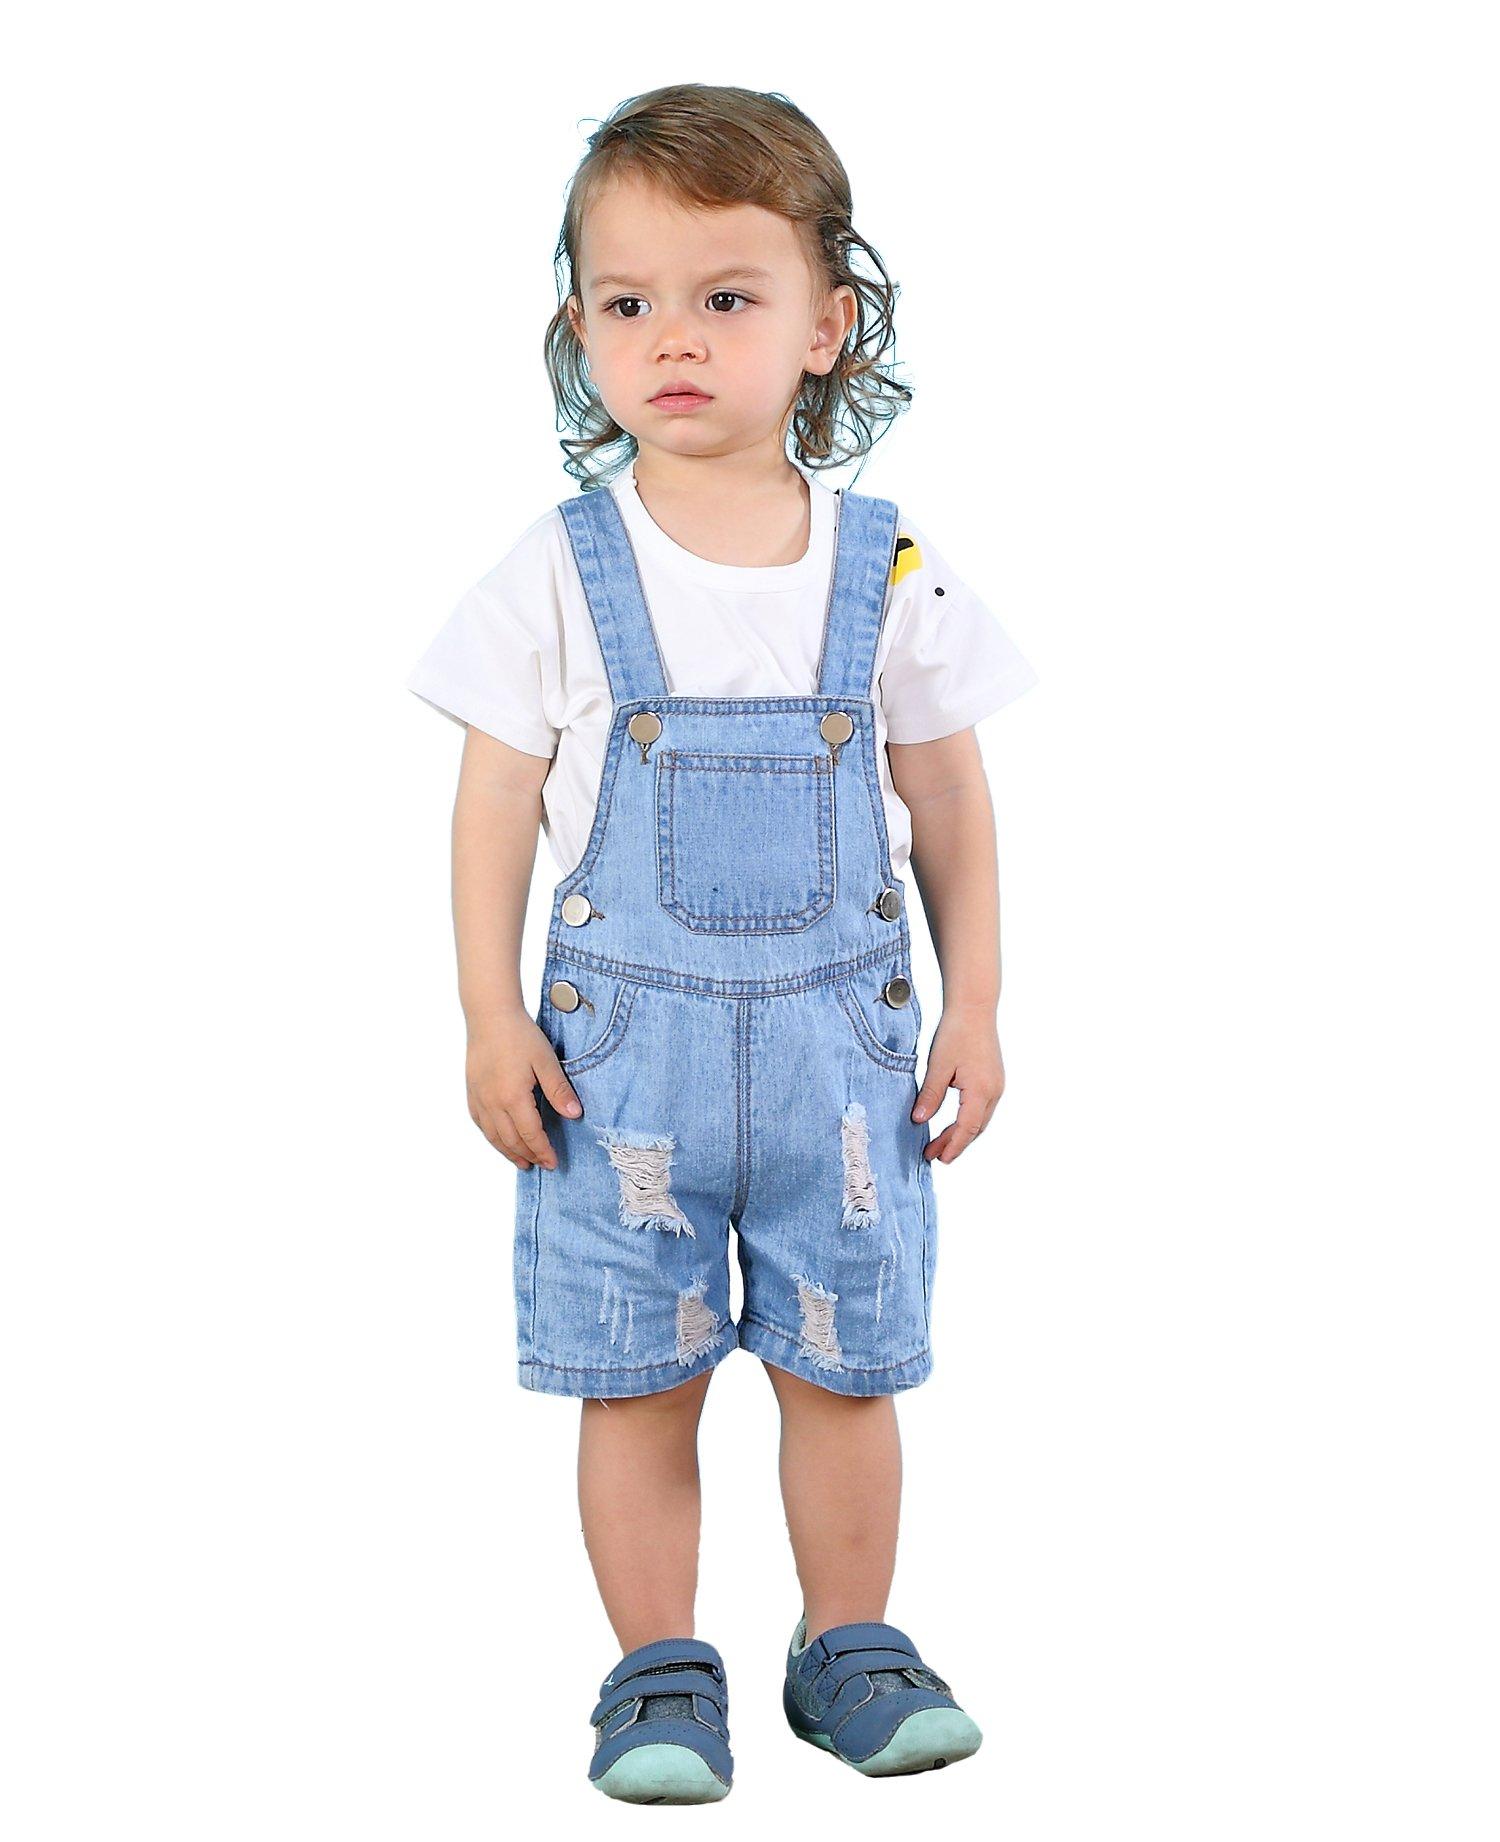 Kidscool Baby & Toddler Girls/Boys Big Bibs Ripped Hole Summer Jeans Shortalls,Light Blue,4-5 Years by Kidscool (Image #1)